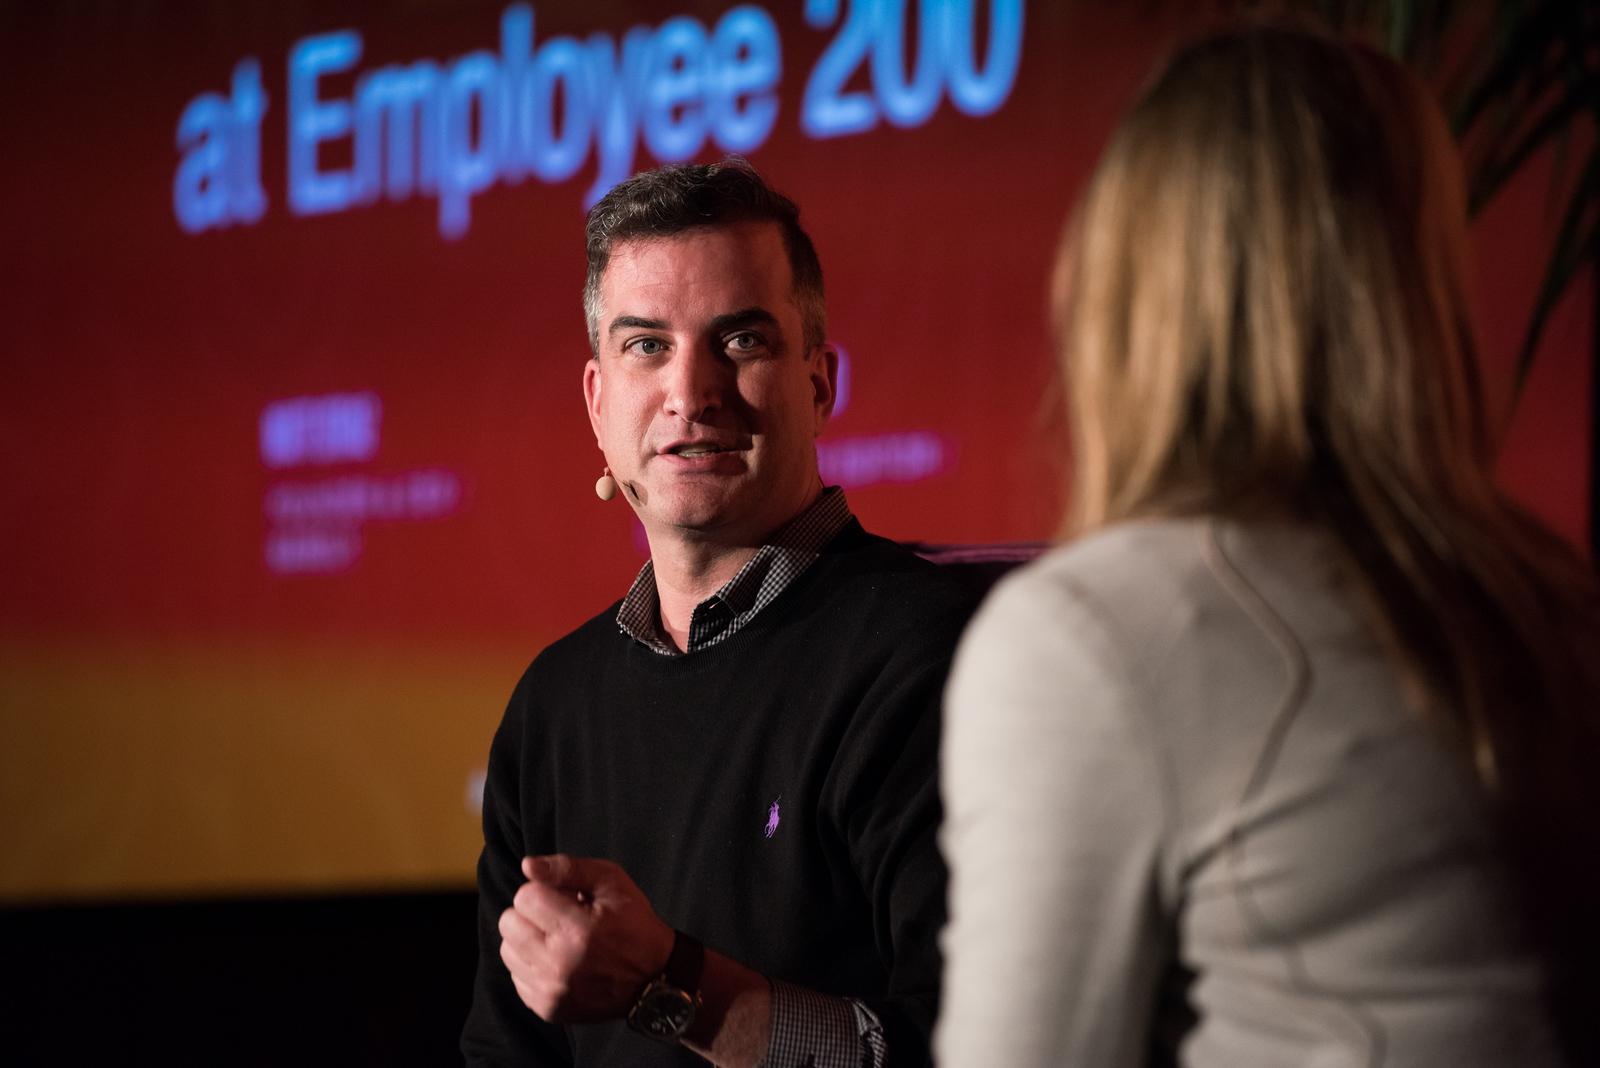 What Changes at Employee 200 Matt Straz FOUNDER & CEO / NAMELY Caroline Fairchild NEW ECONOMY EDITOR / LINKEDIN